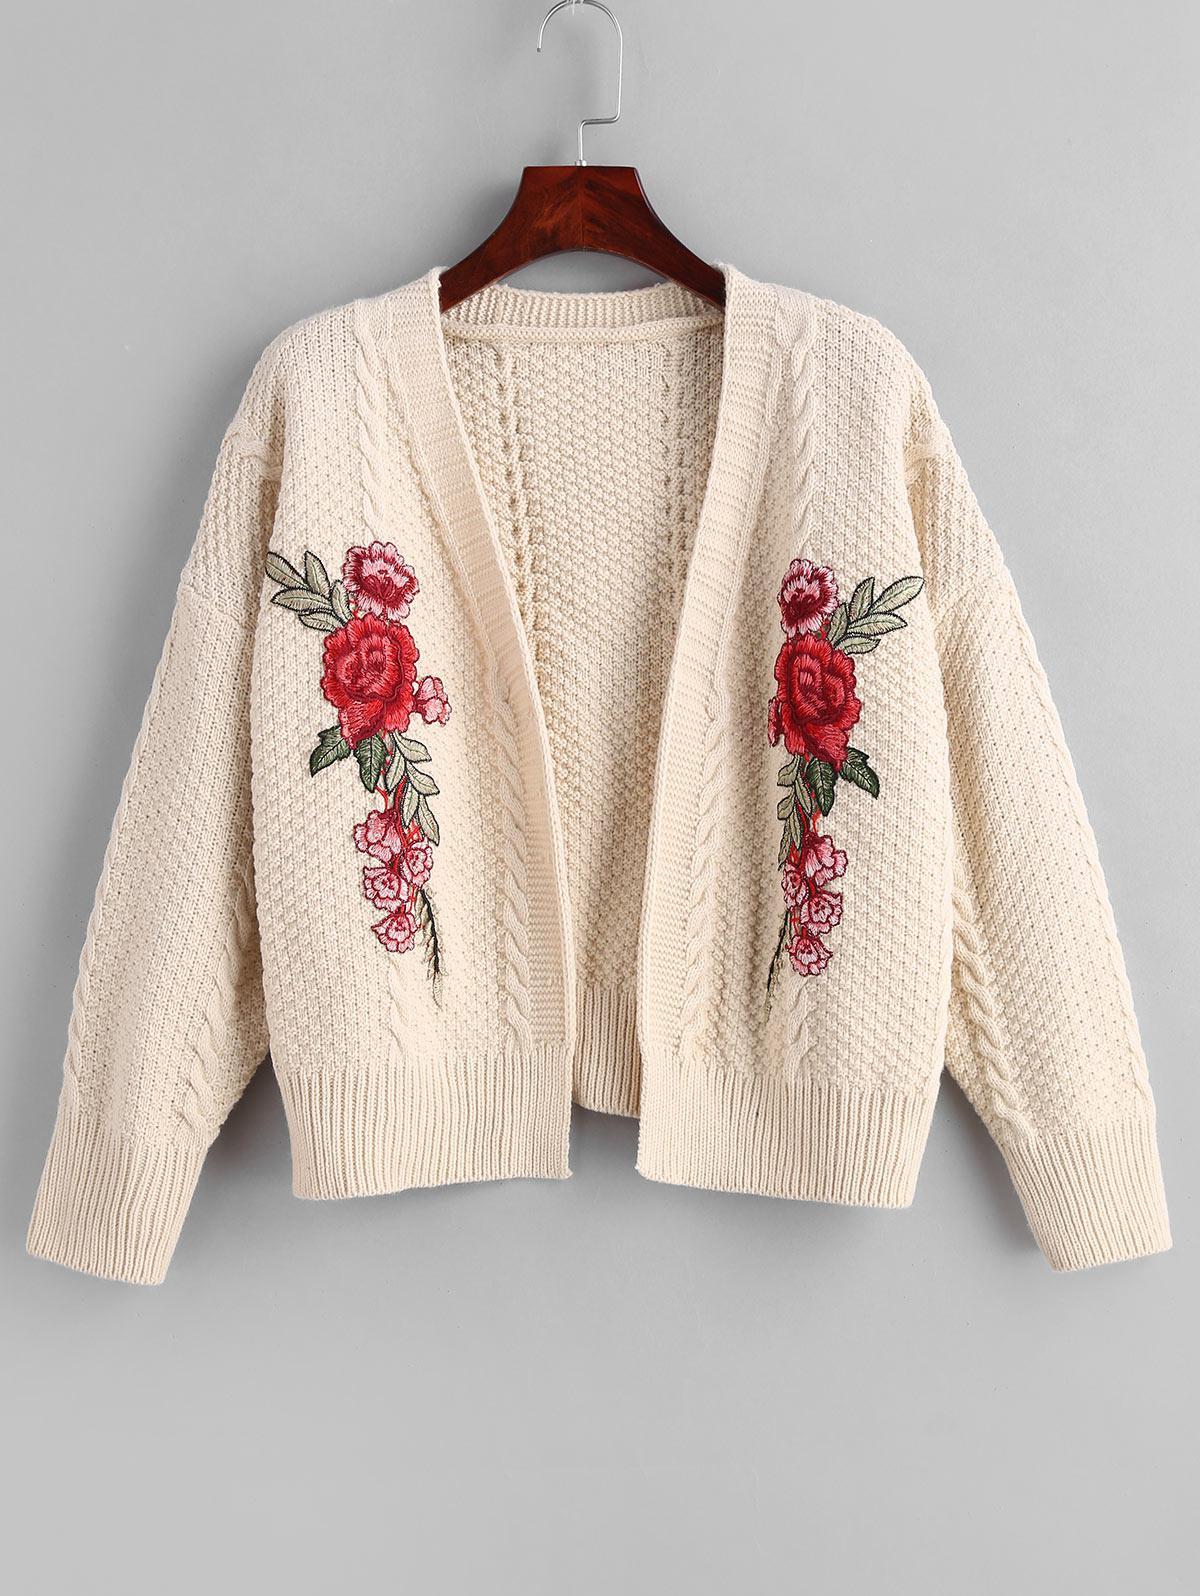 Drop Shoulder Floral Embroidery Cardigan